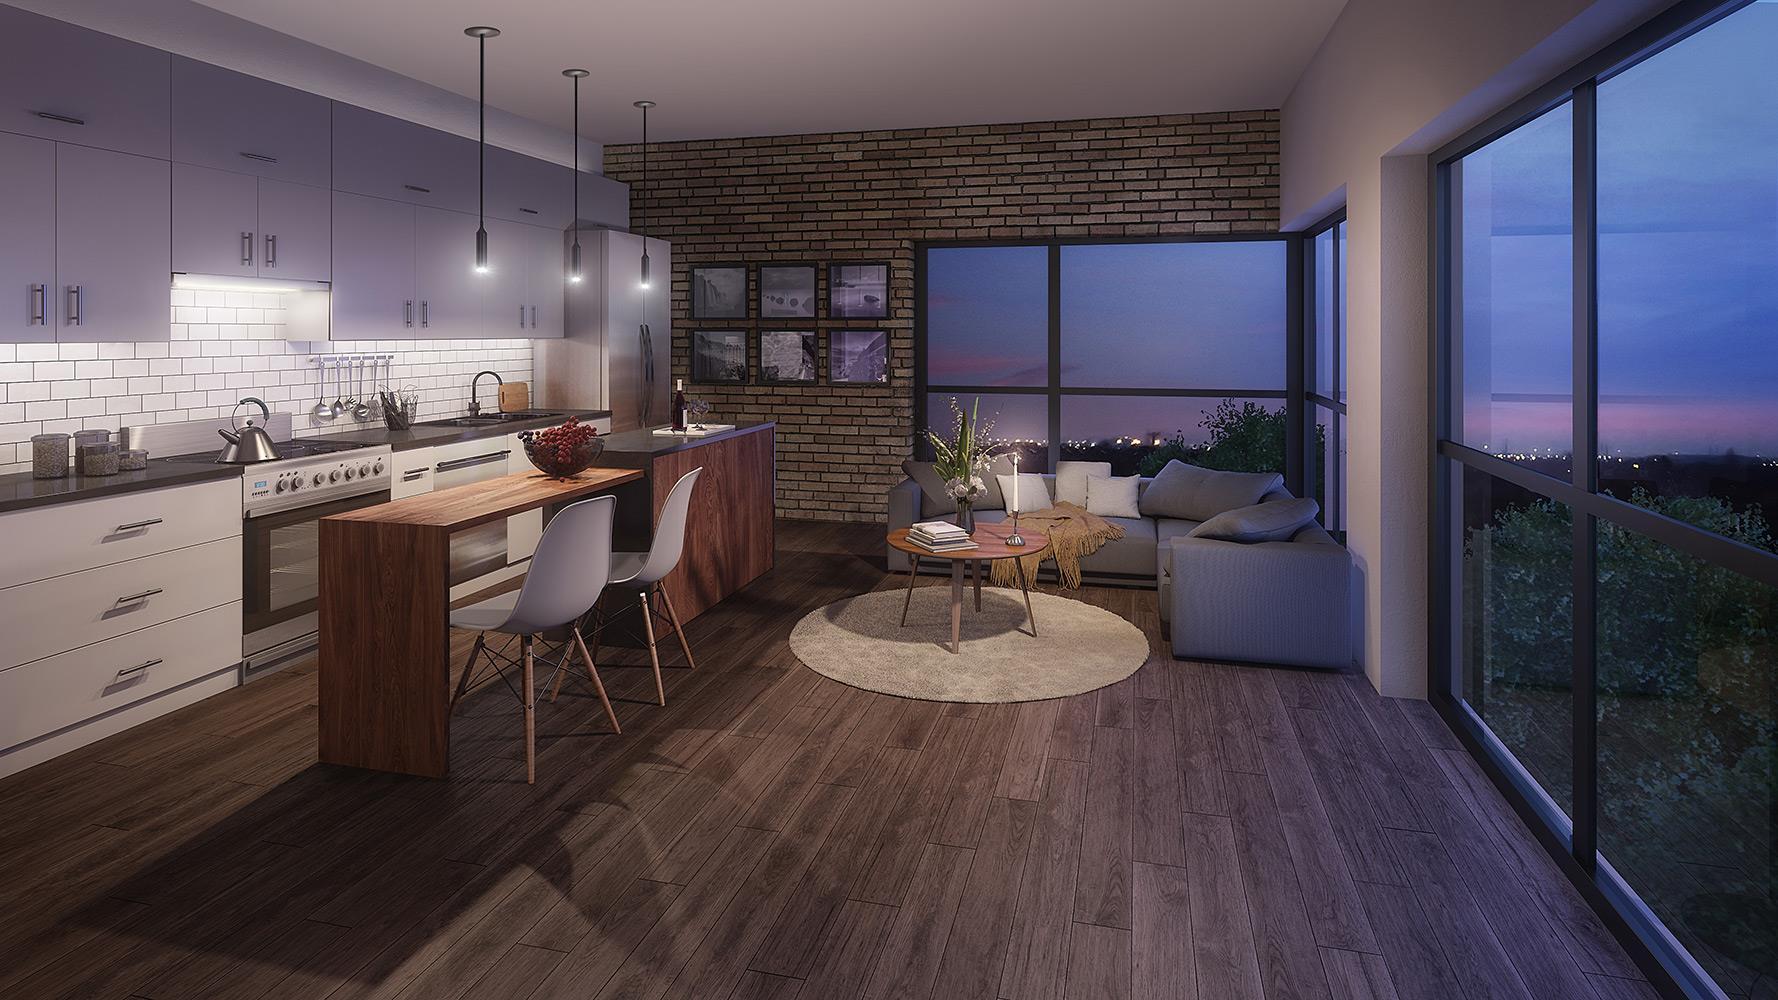 Interior photo of Midtown Lofts